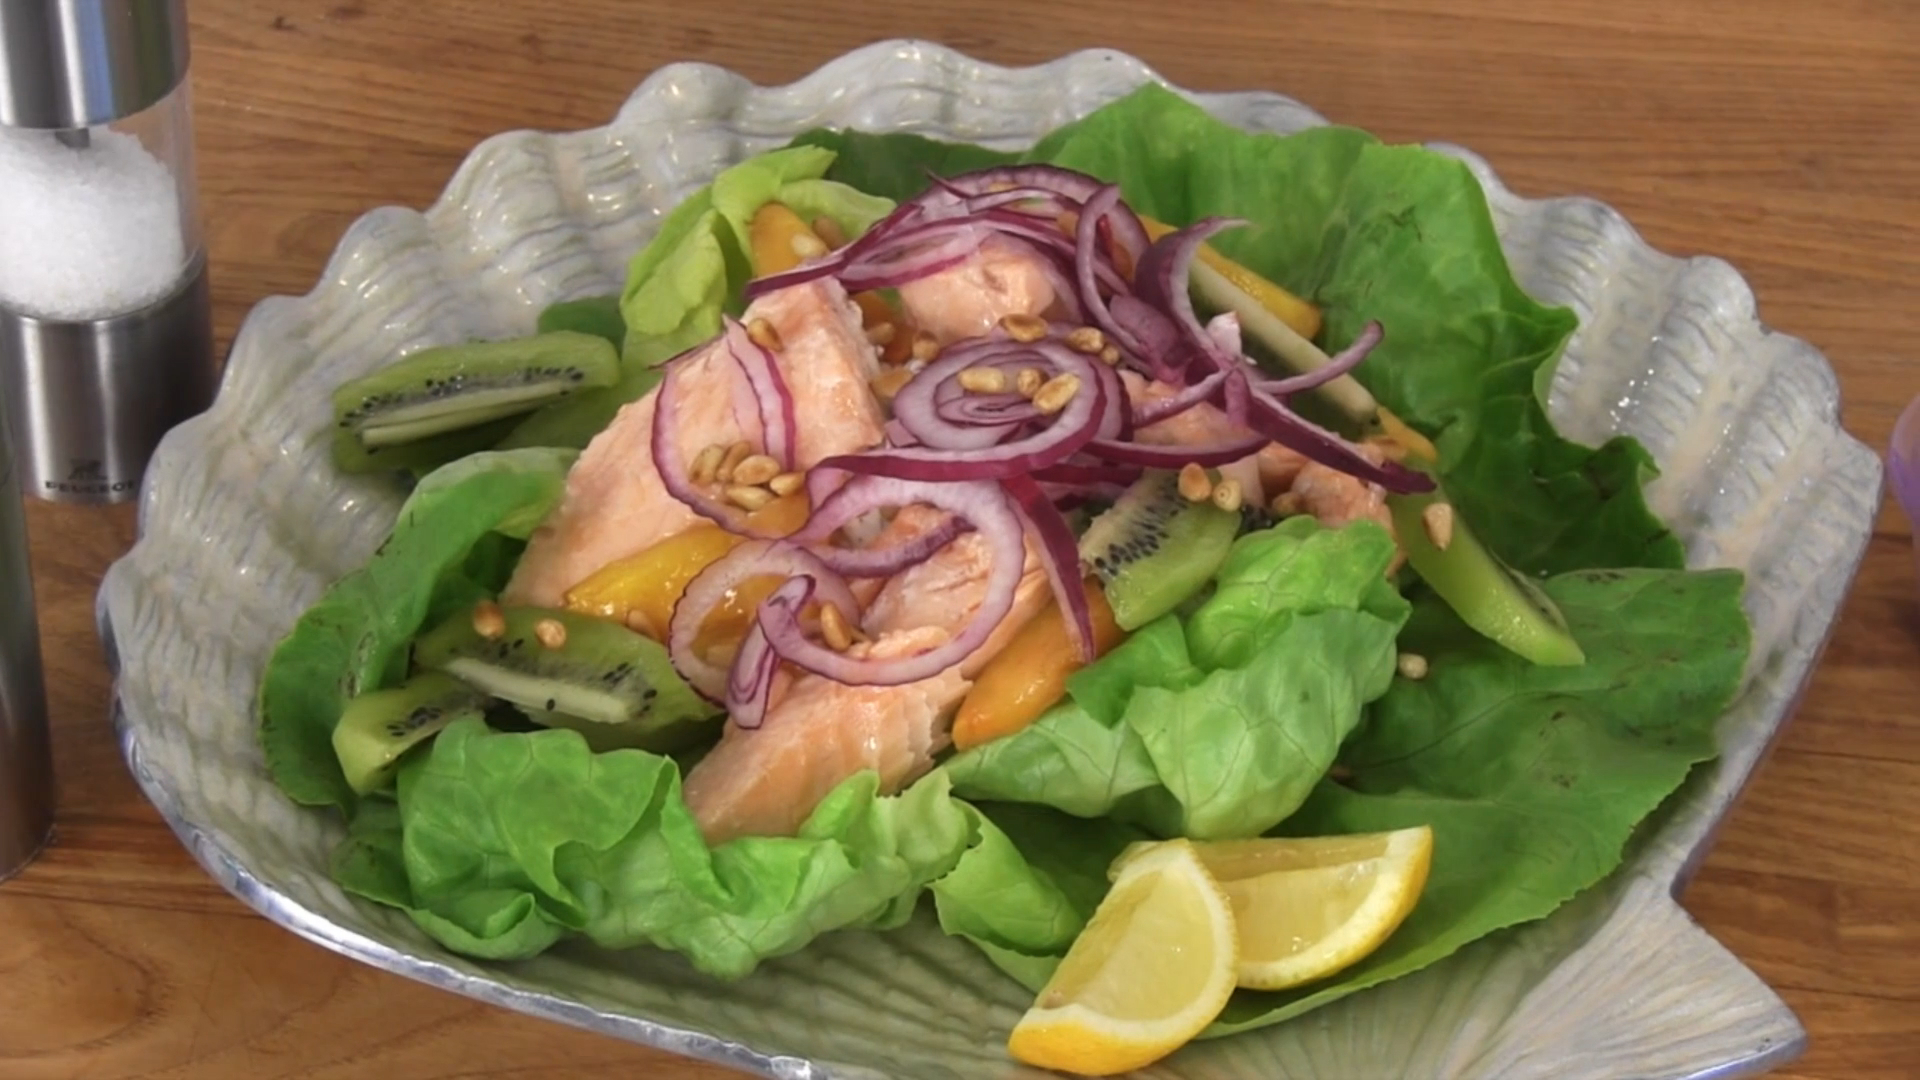 How to Make a Salmon Salad